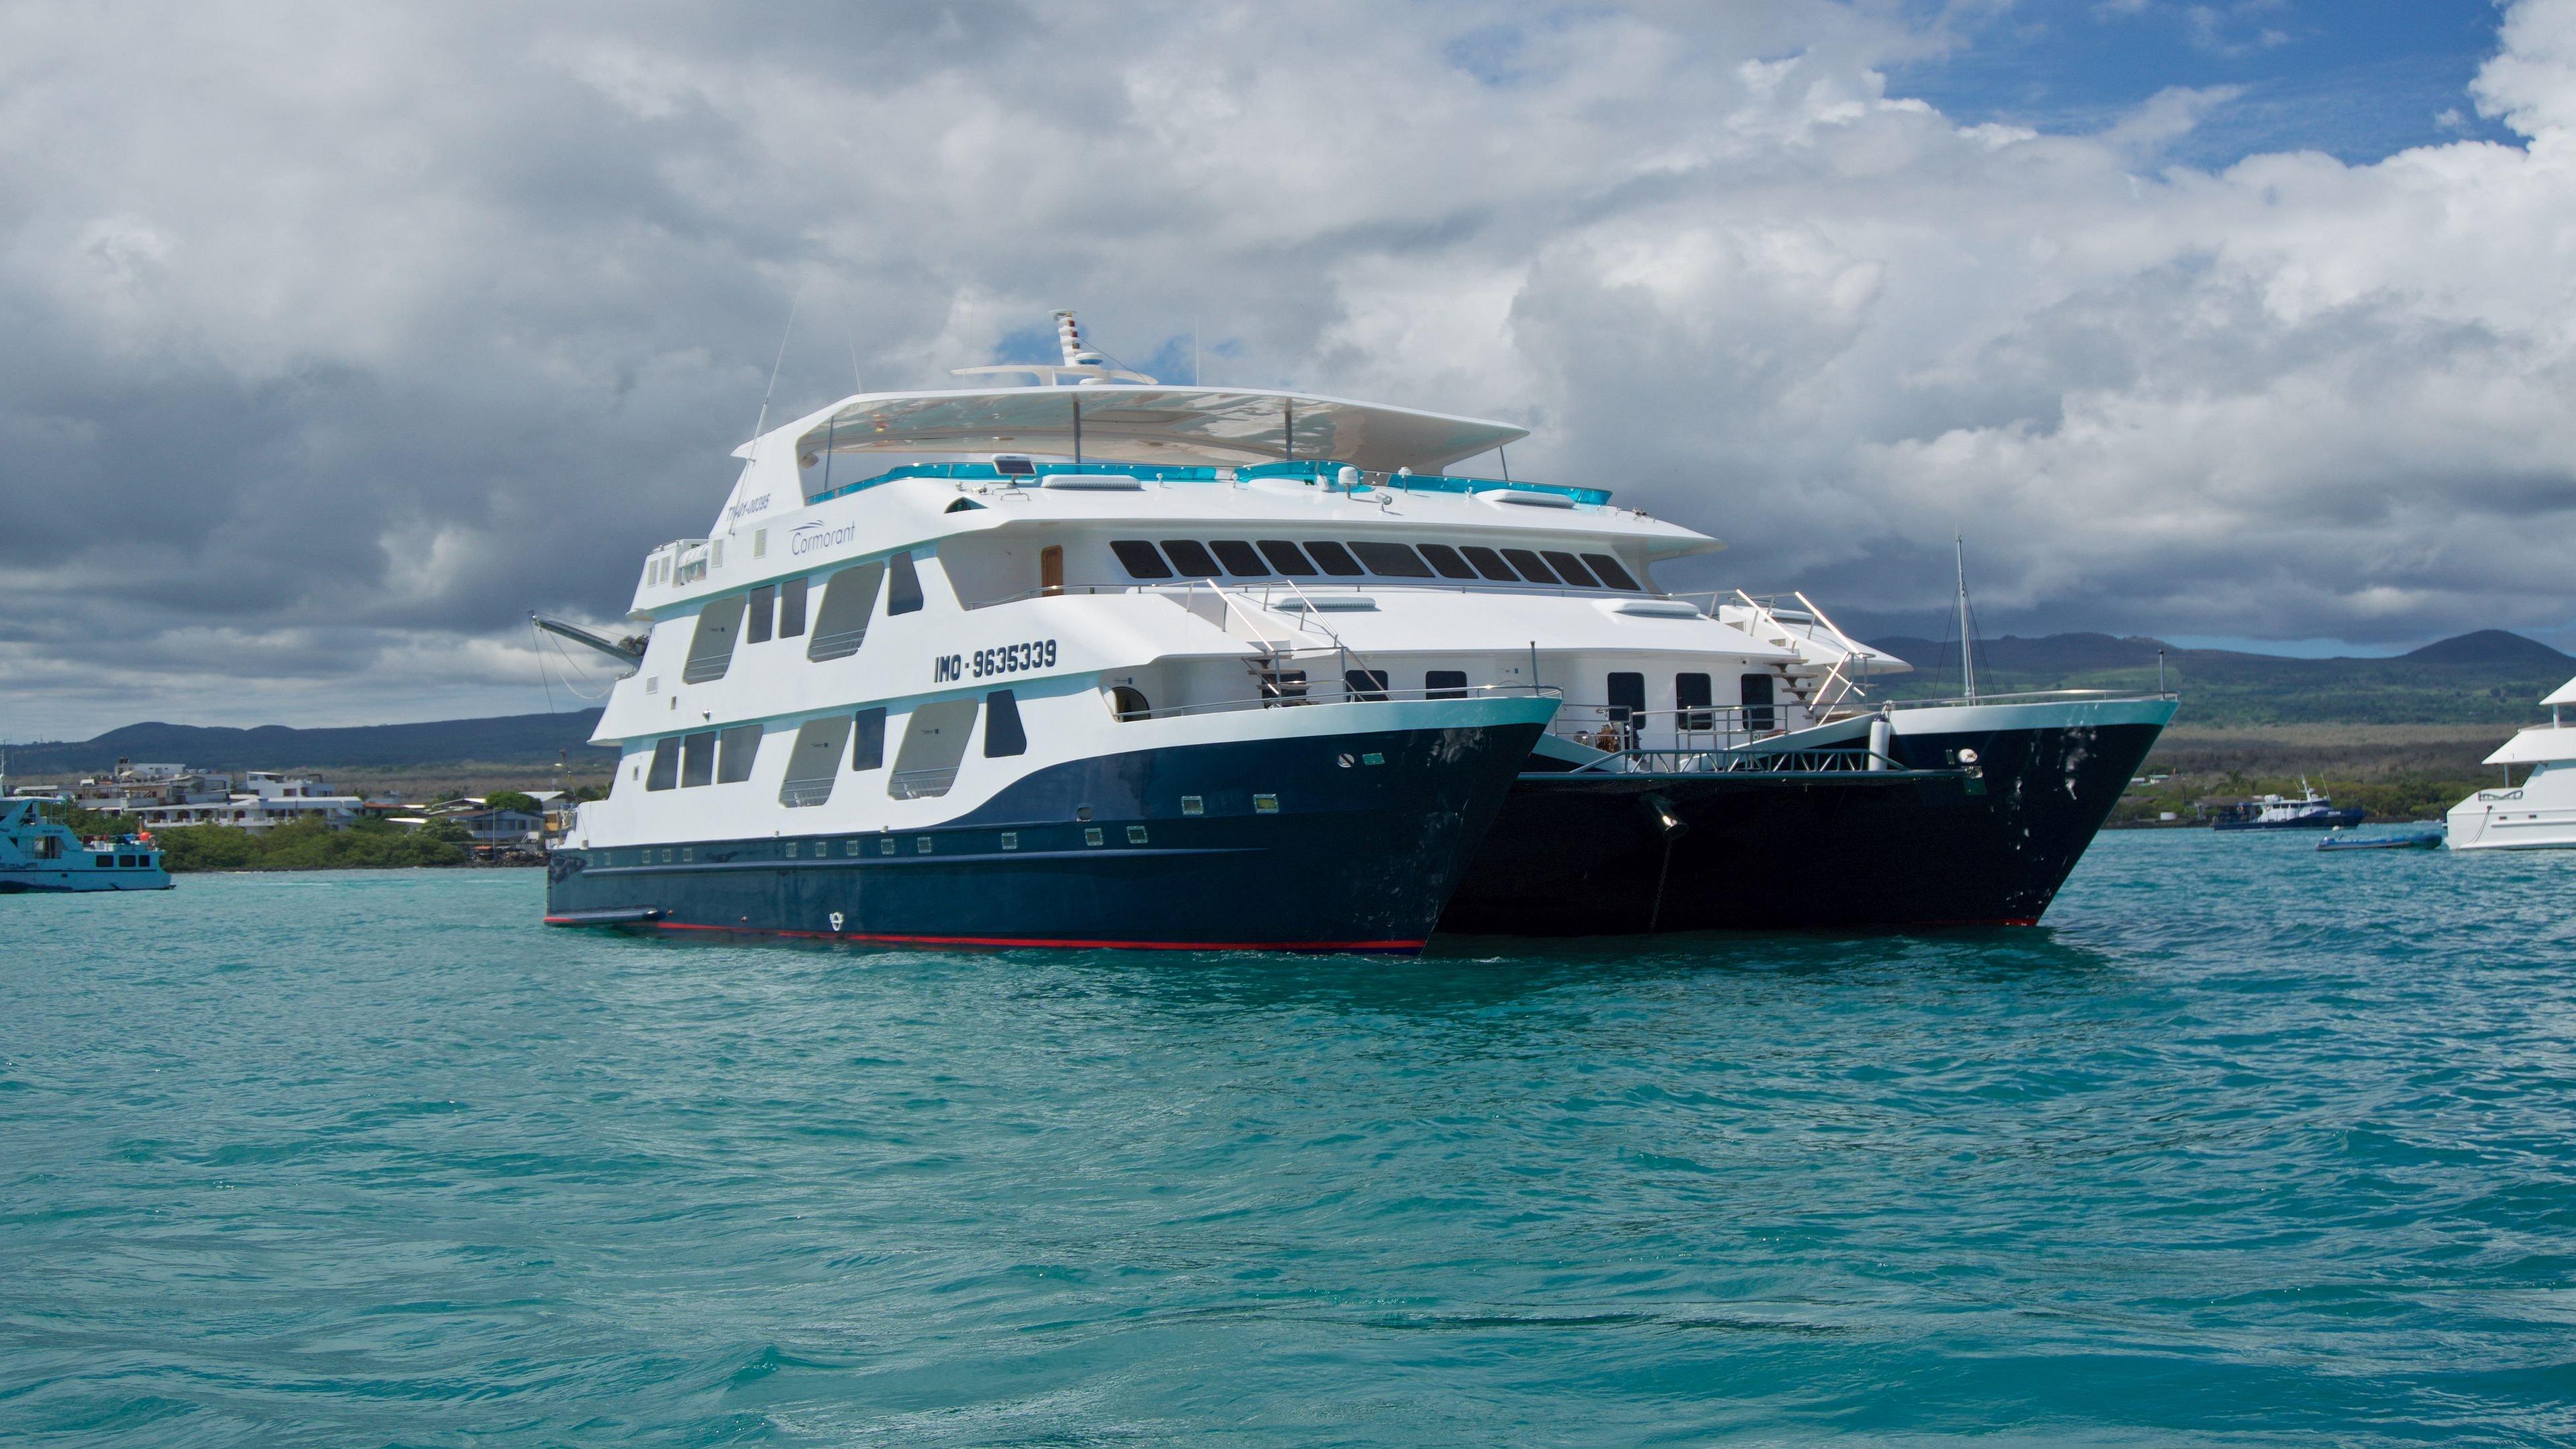 Cormorant Catamaran, Galapagos